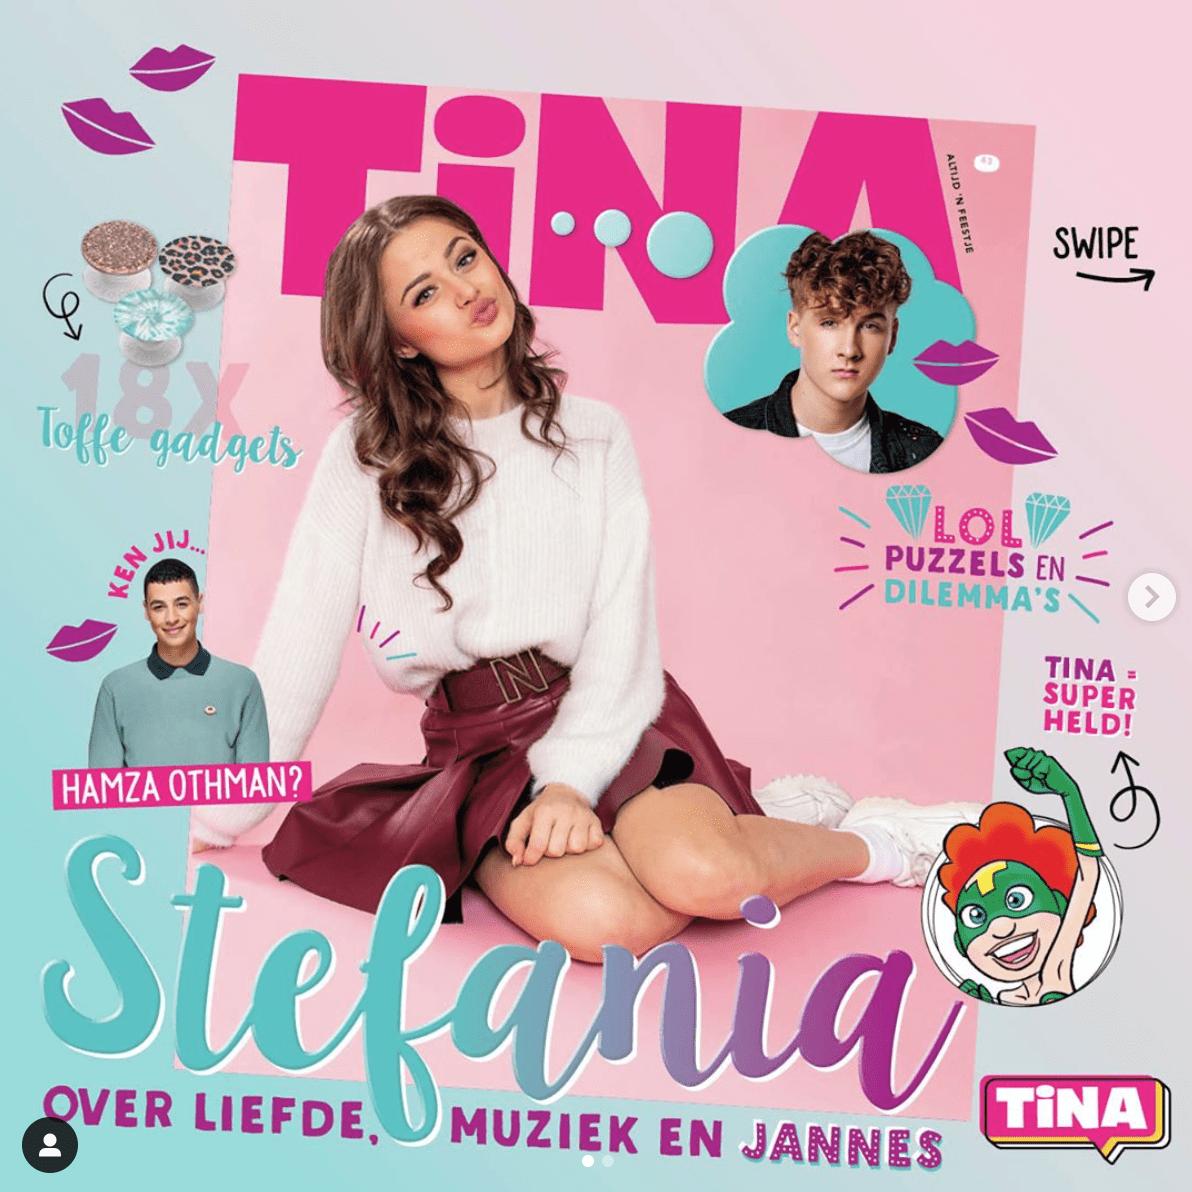 tina-cover-tijdschrift-stefania-timewall